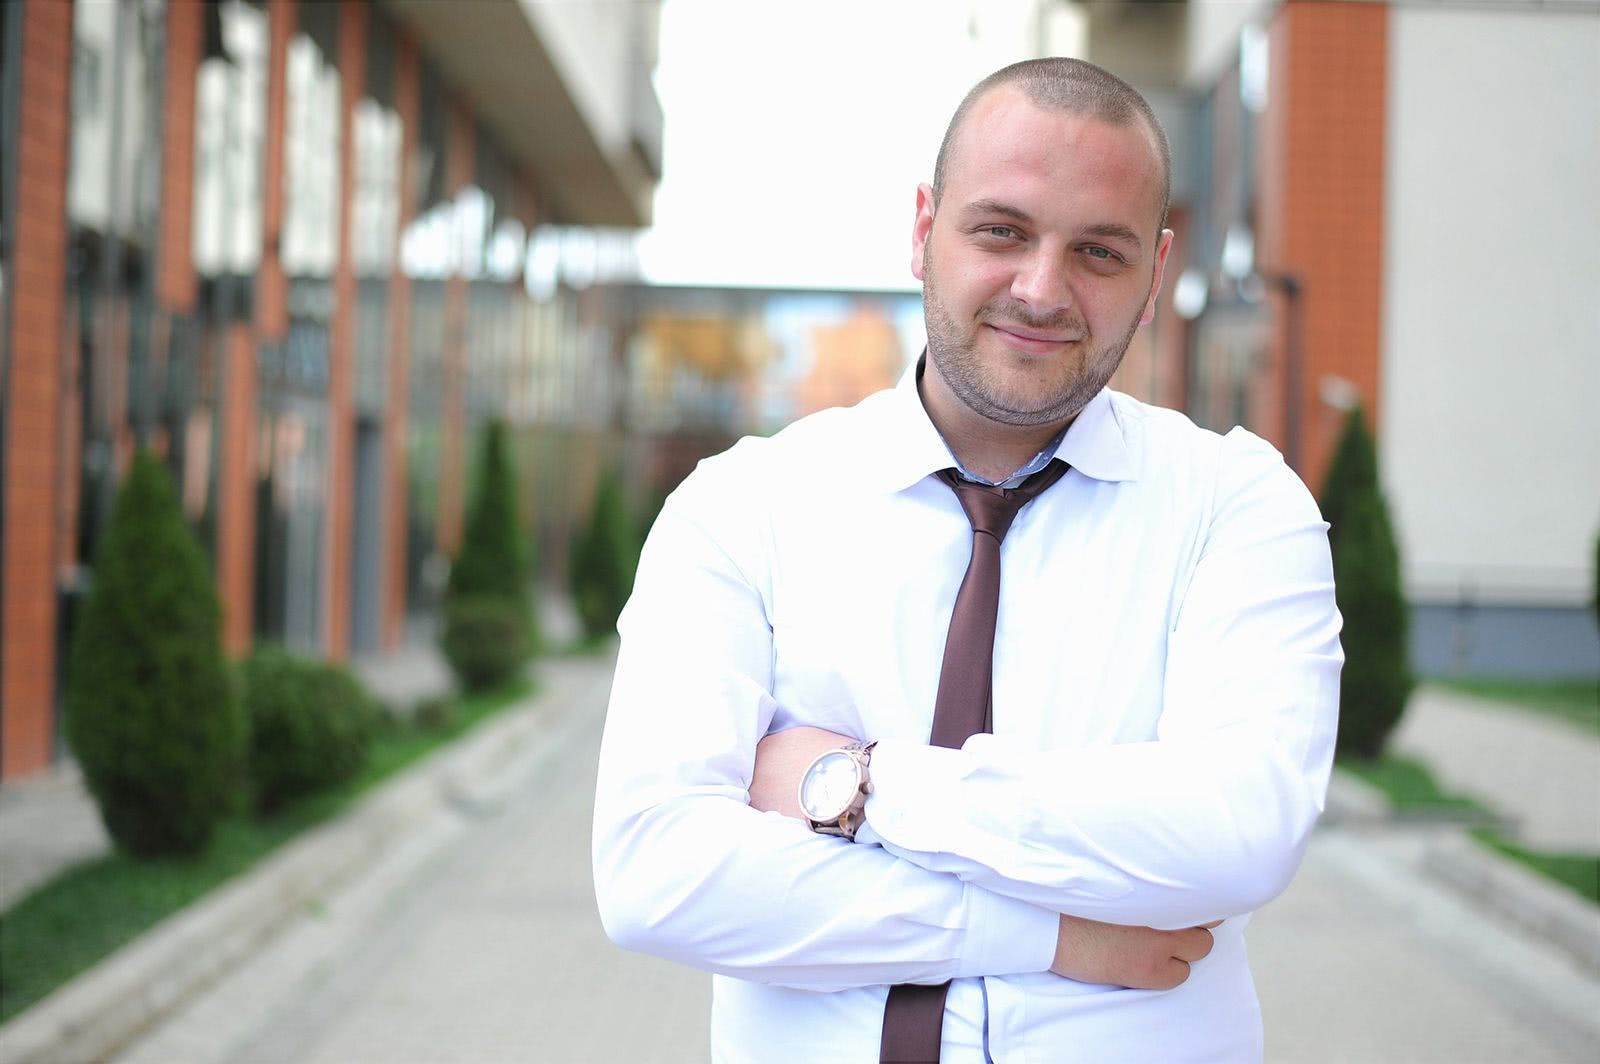 Motivated businessman